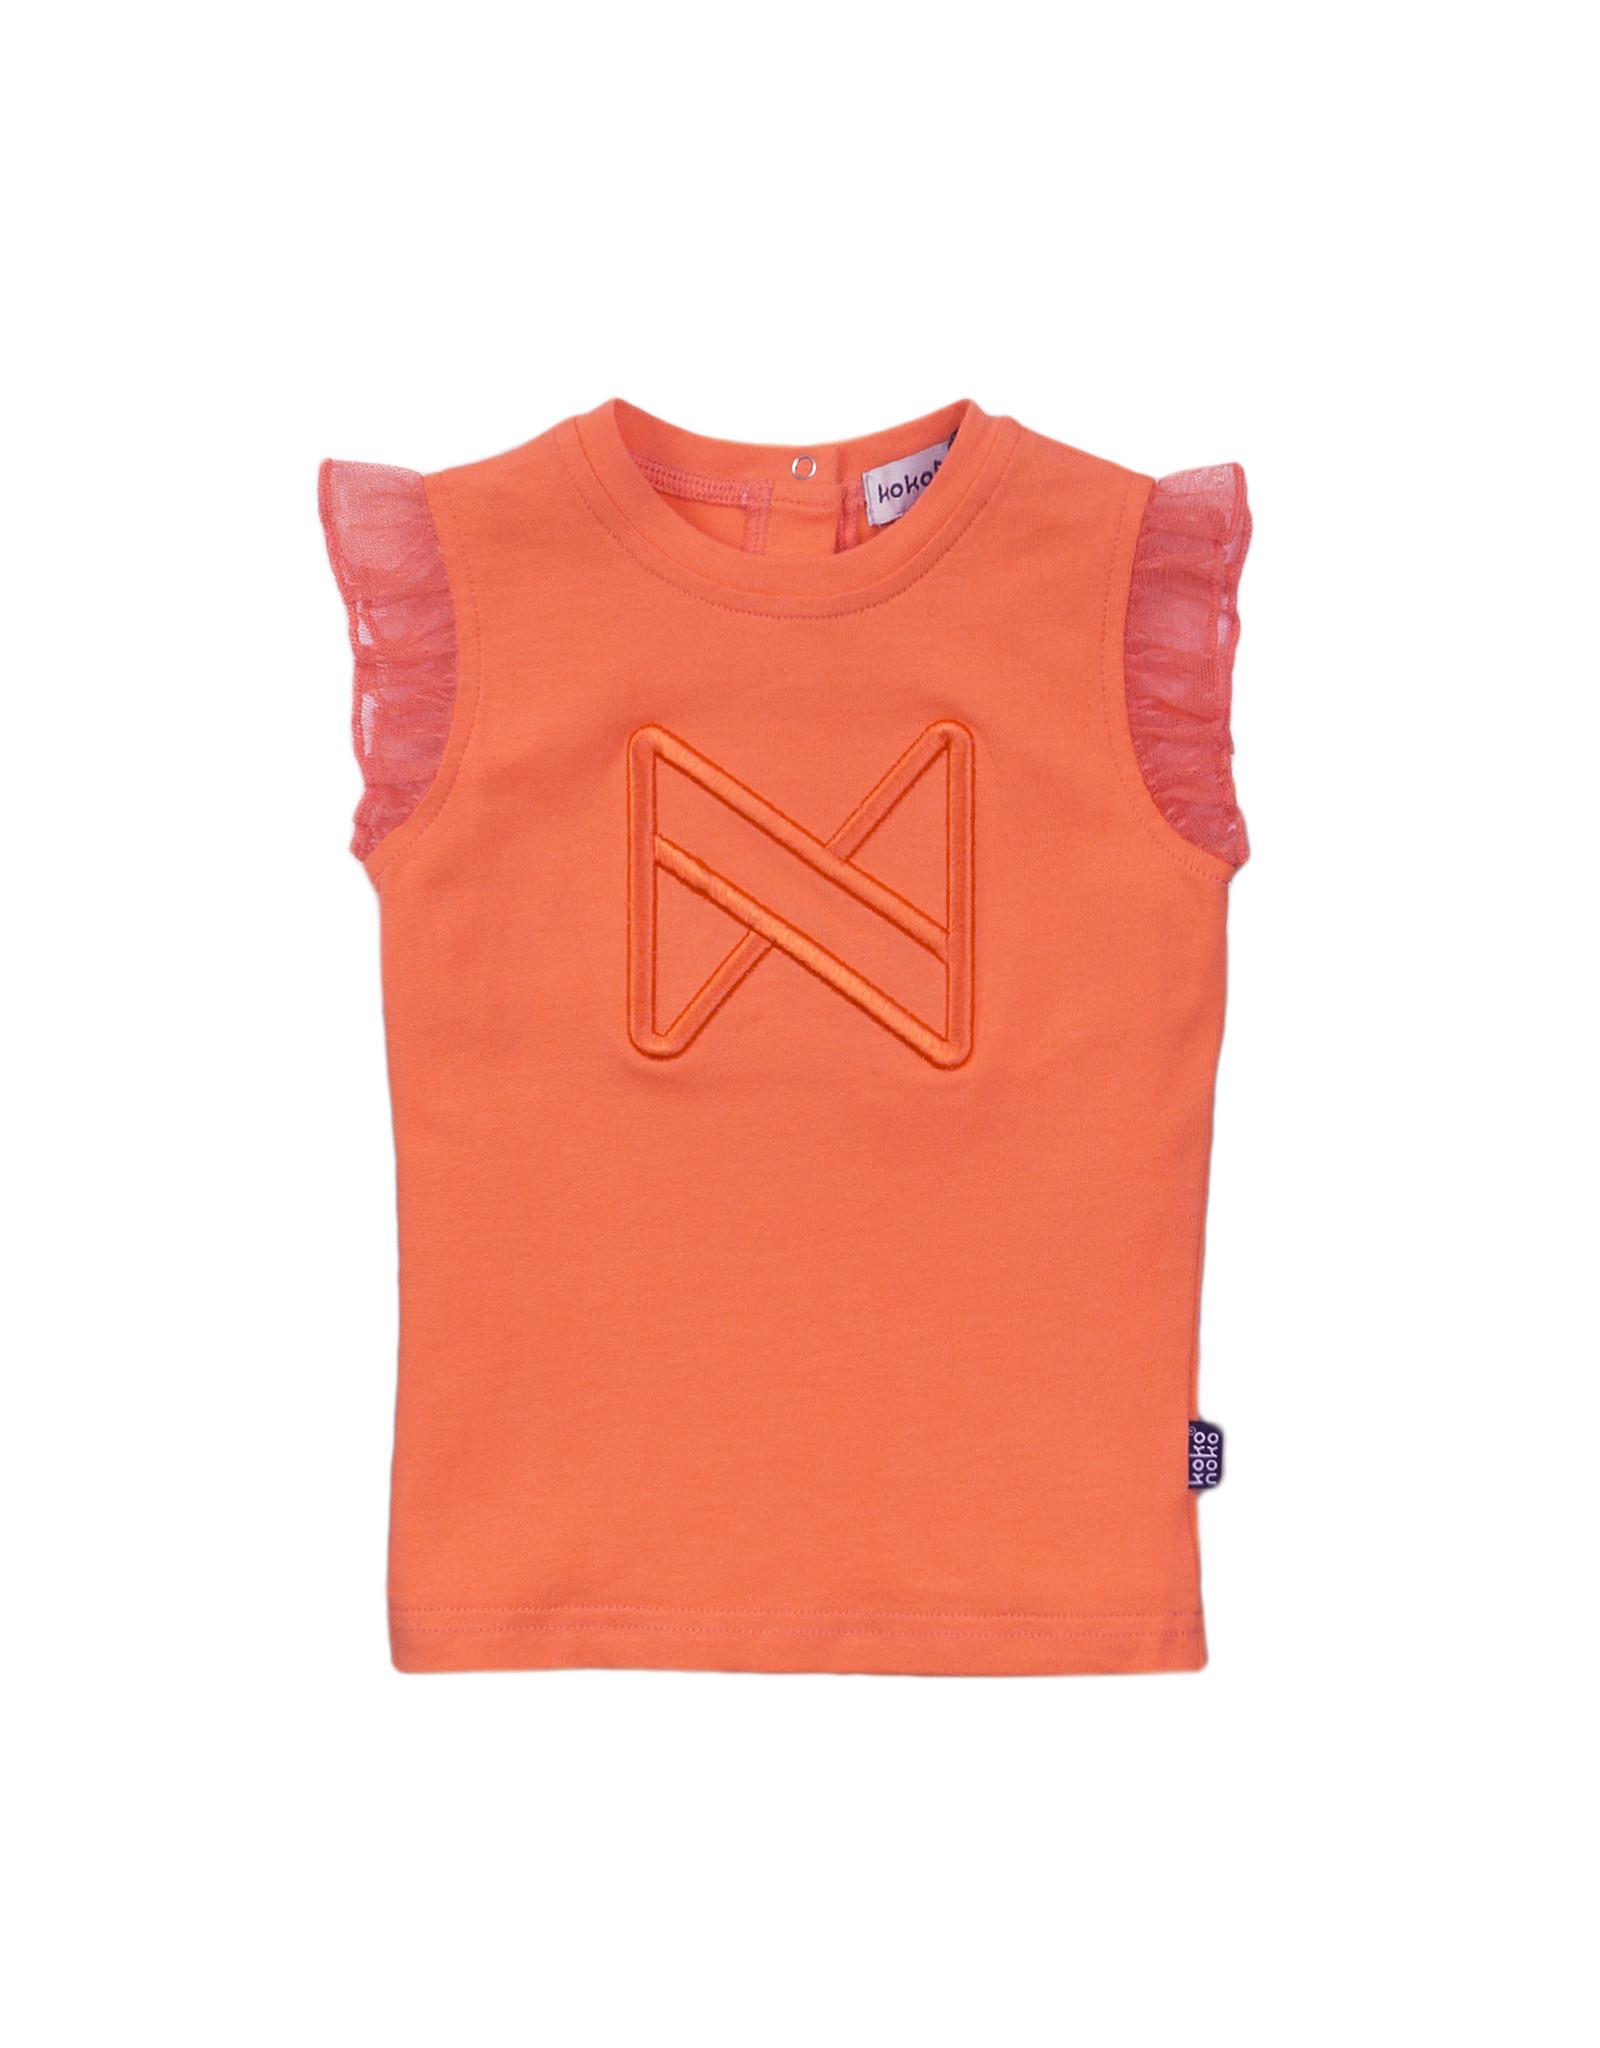 Koko Noko T-shirt ss, Orange, SS21